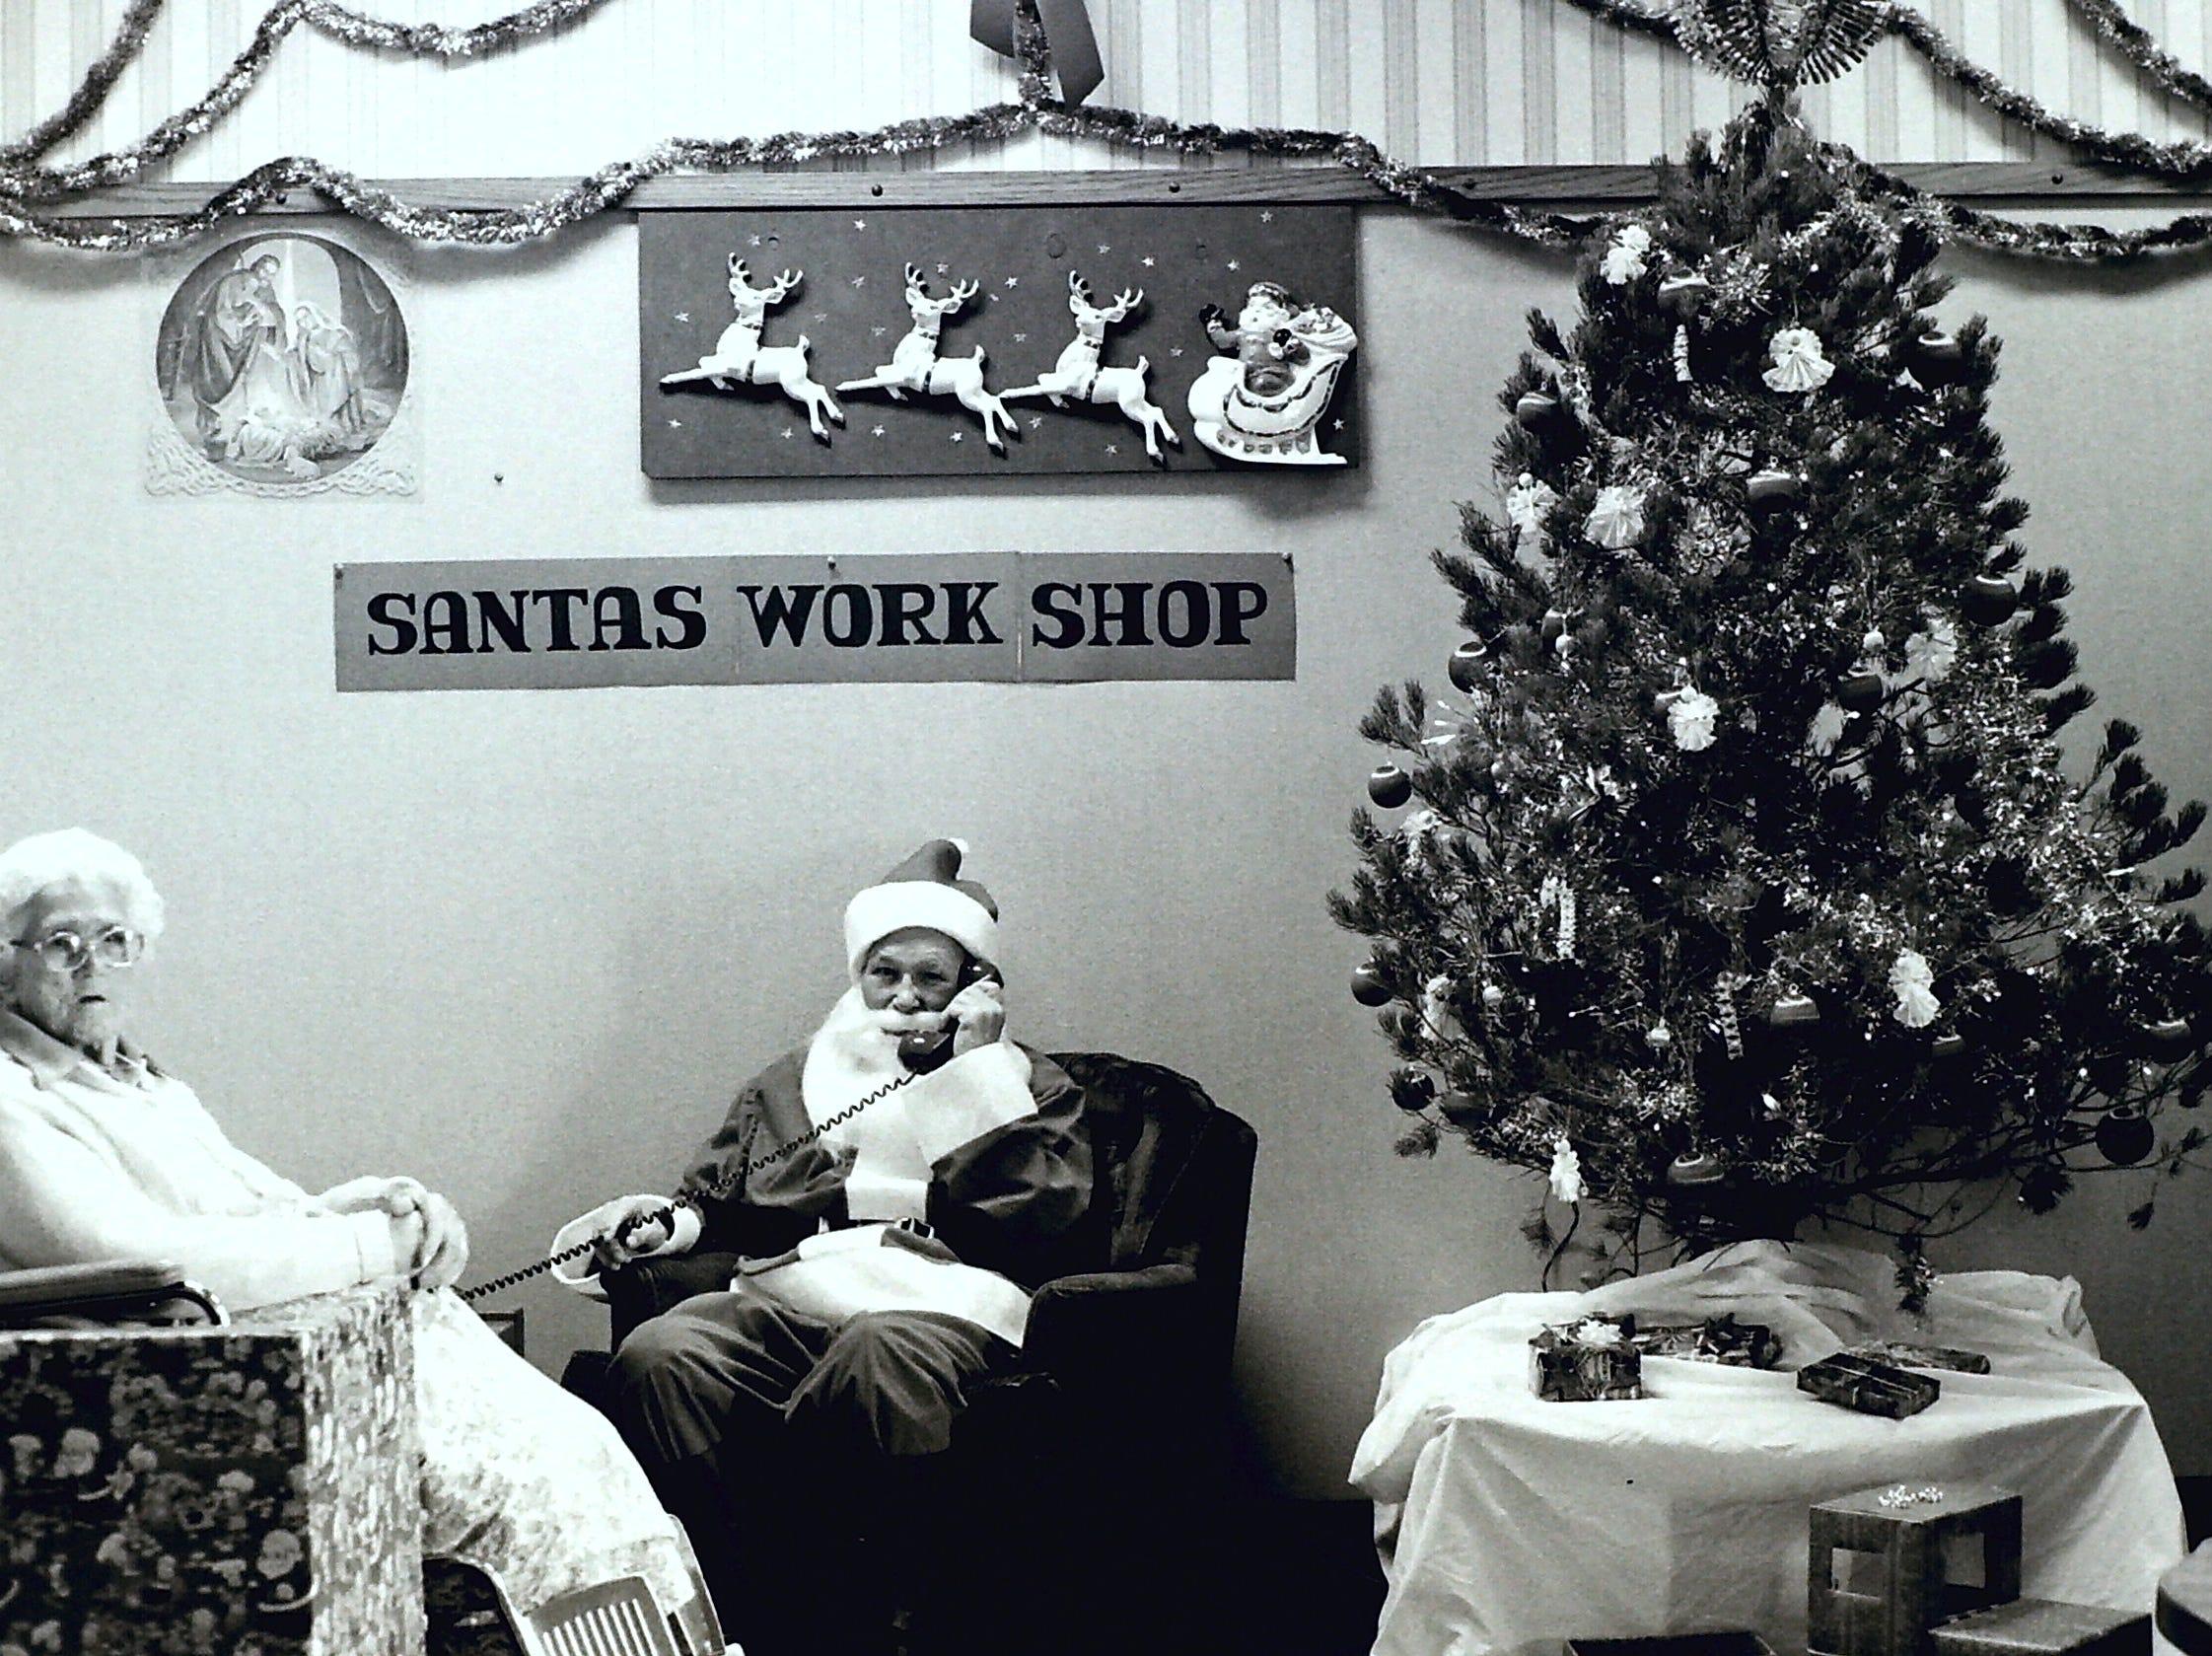 St. George Care Center Holiday Hotline circa 1985.